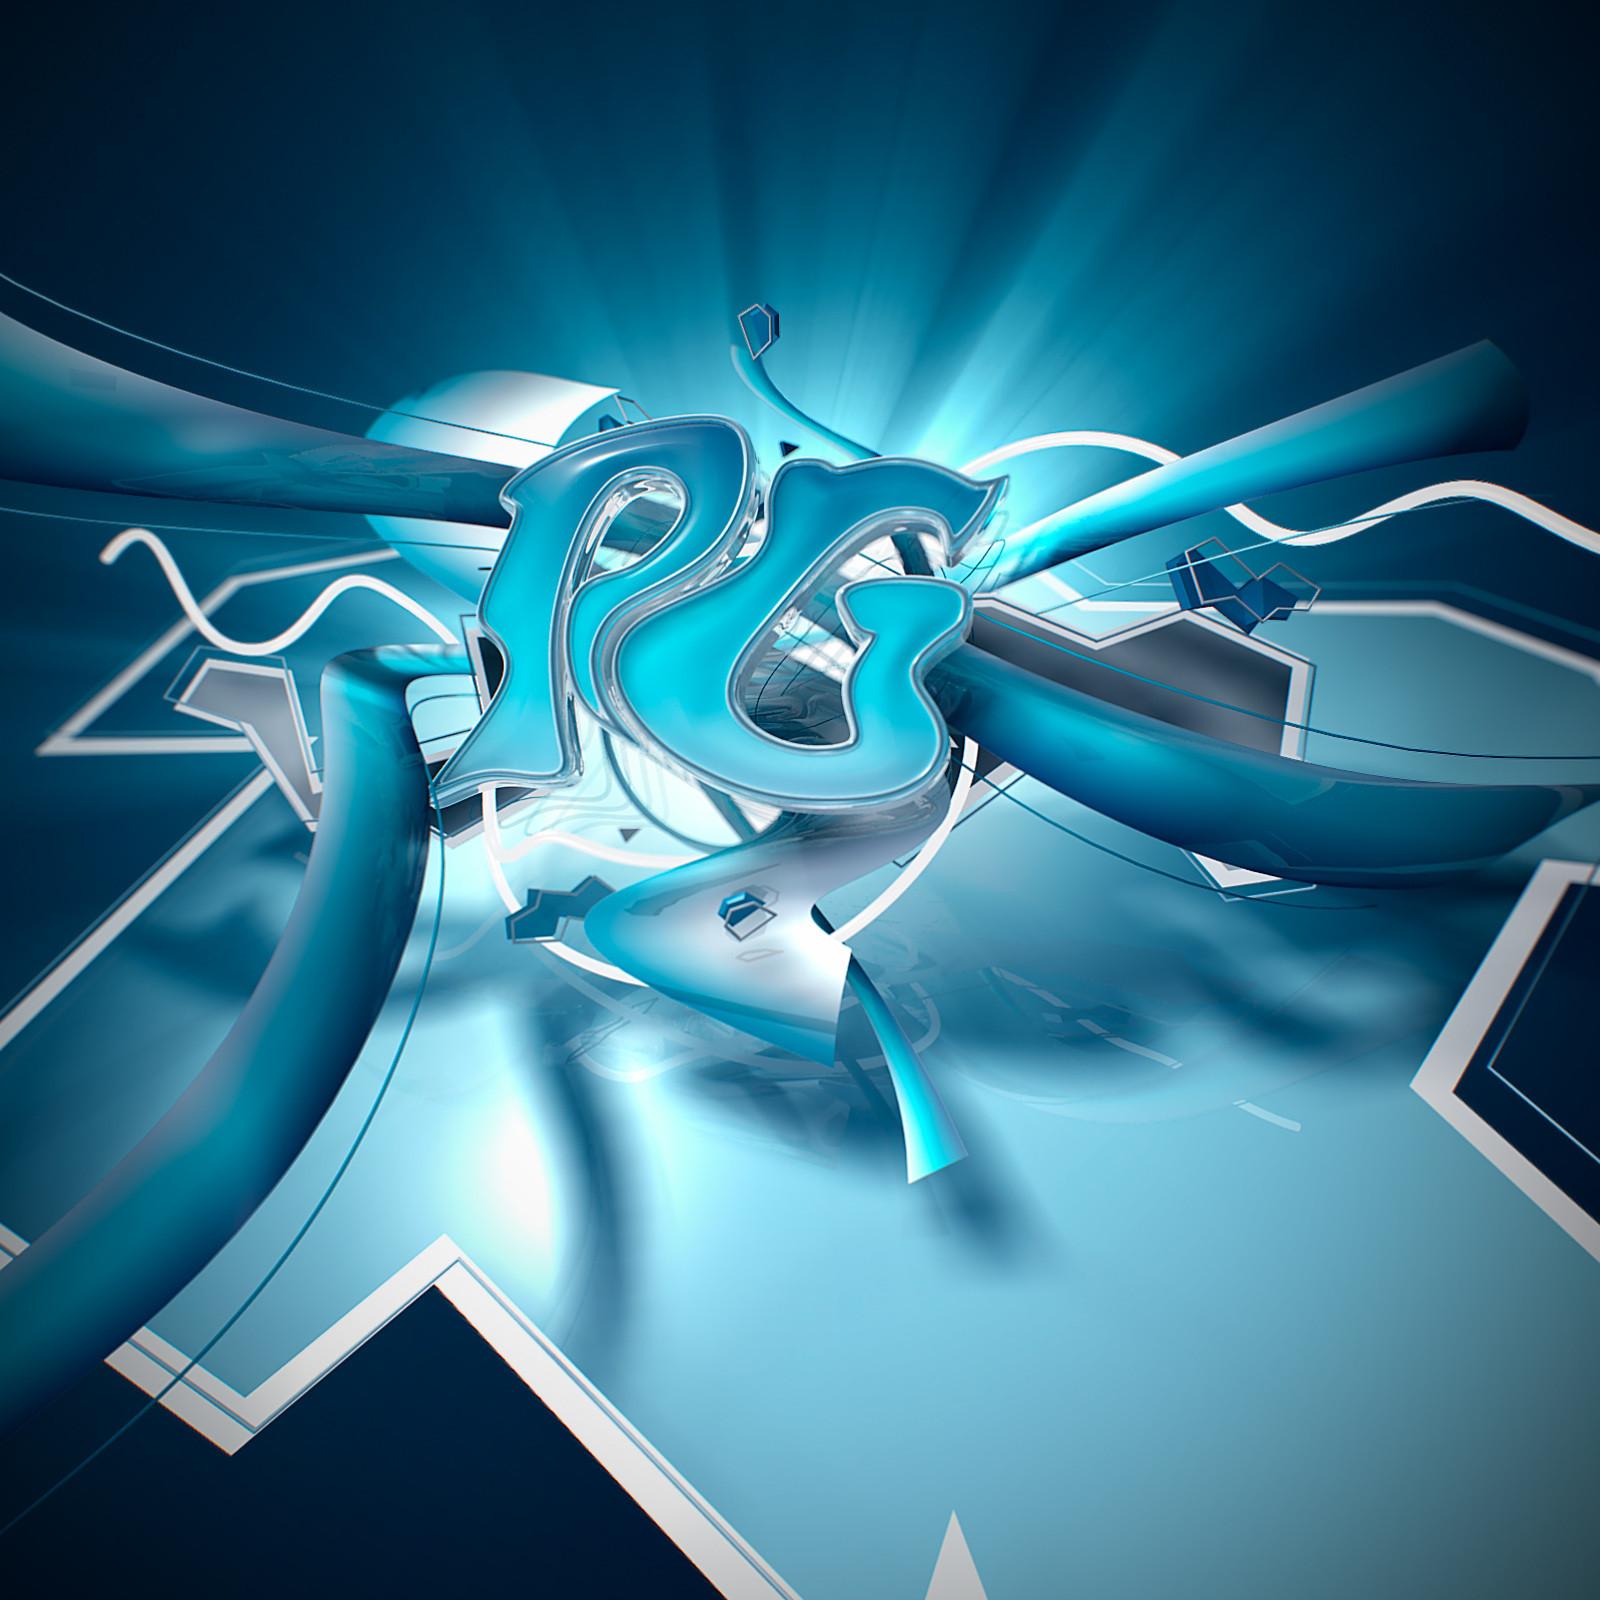 logo-front.jpg